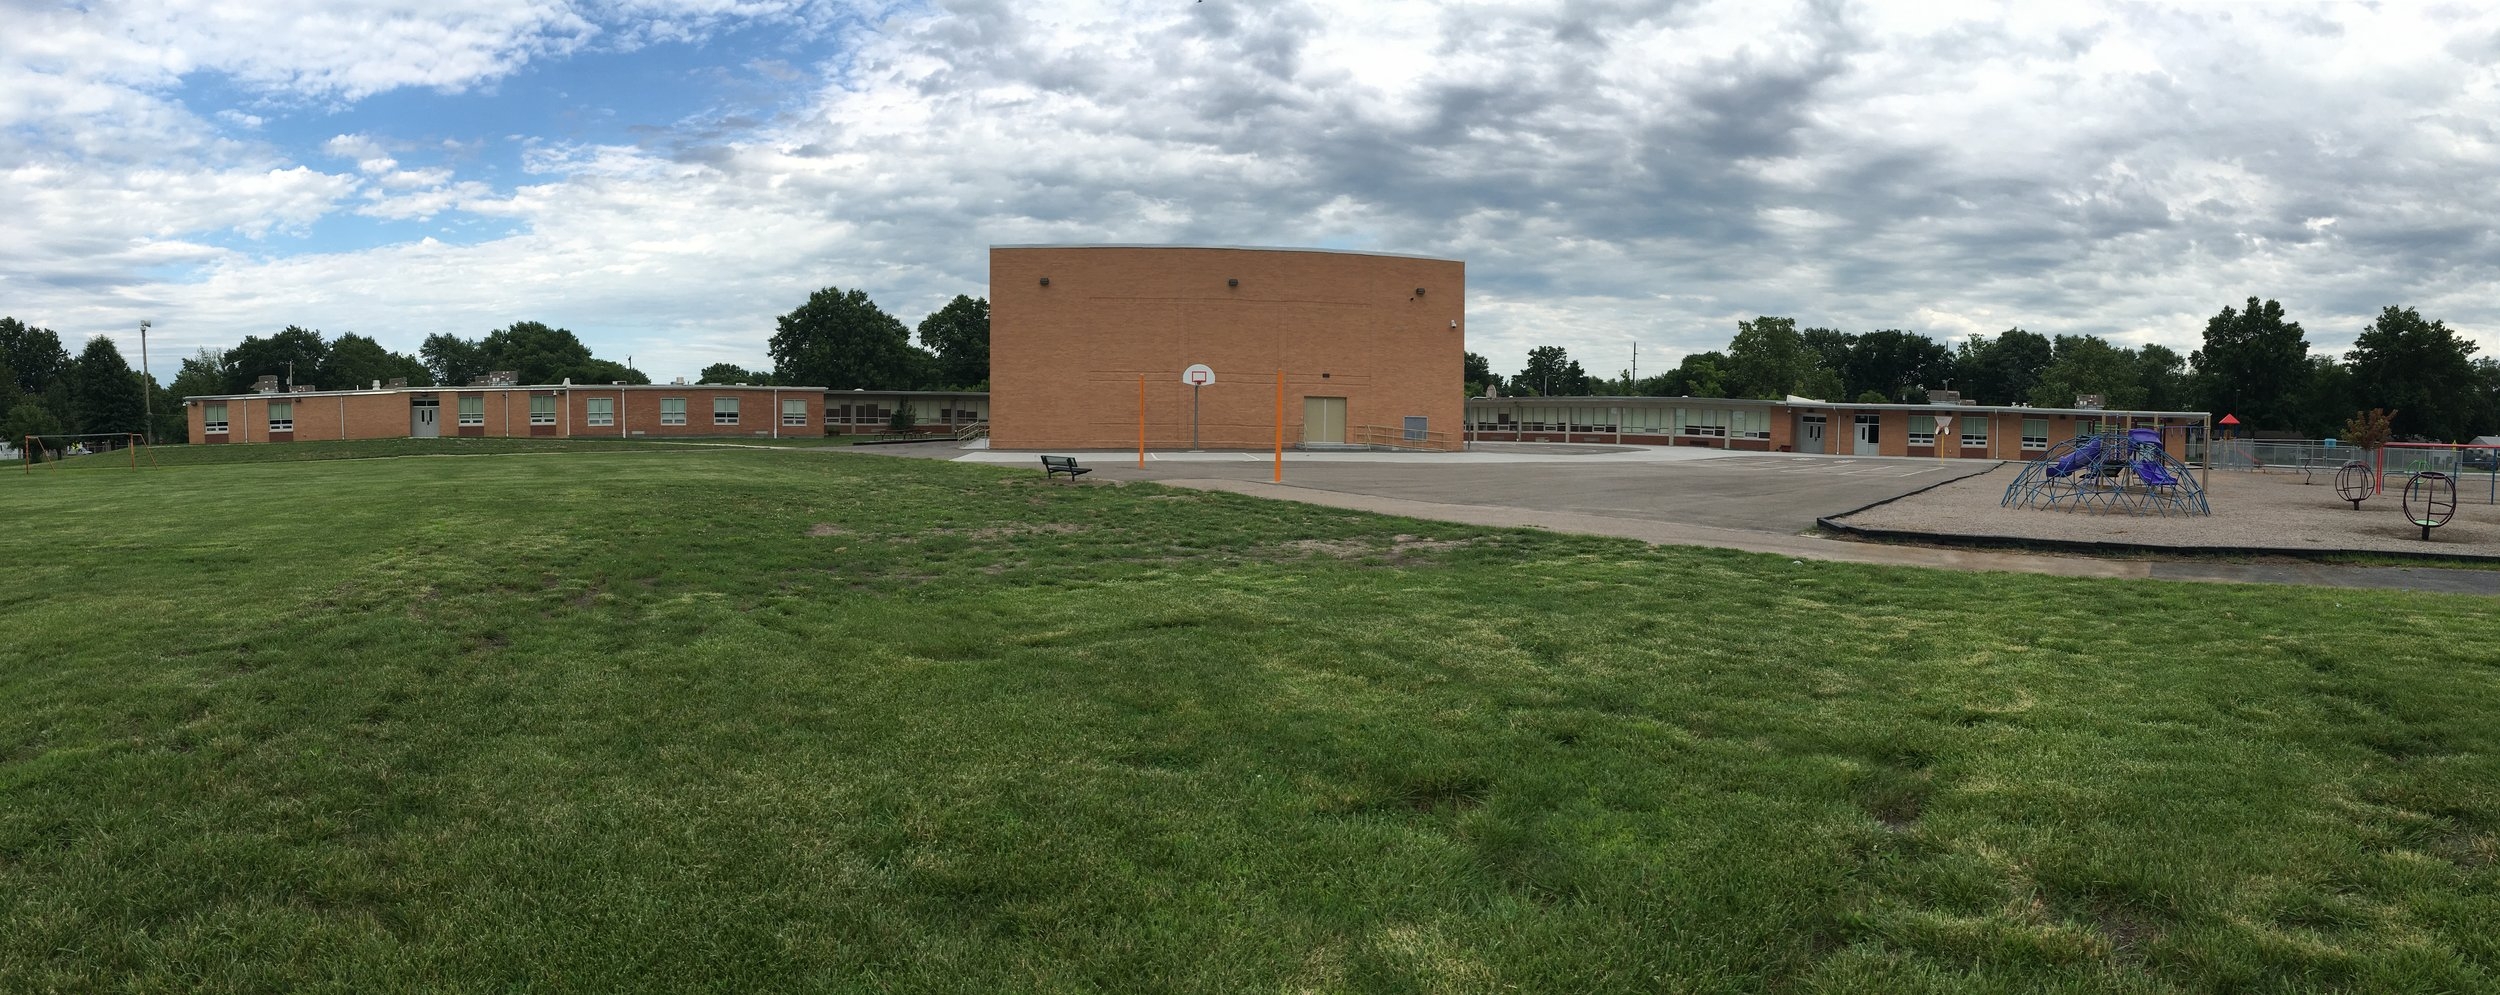 McCarter Elementary Window Replacement   Client: USD 501 Topeka Public Schools Architect: USD 501 Topeka Public Schools